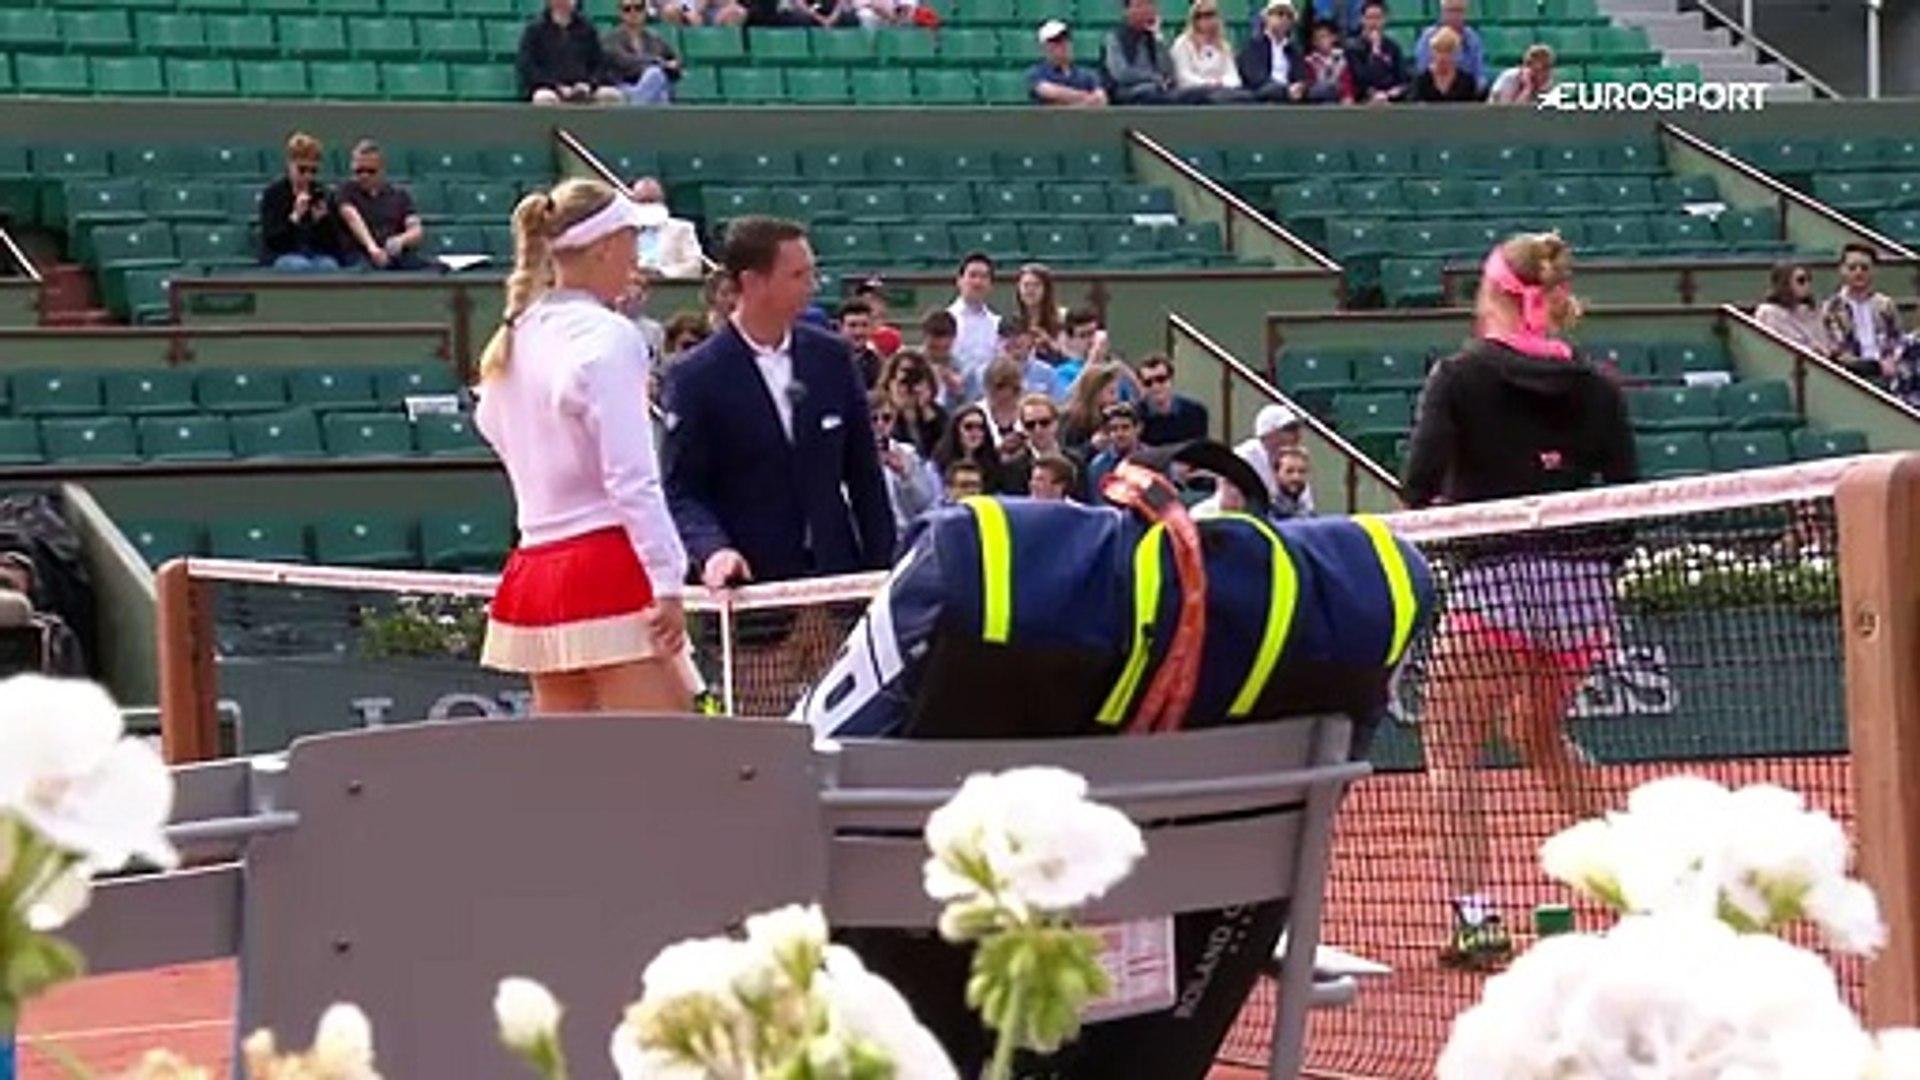 Roland Garros: Caroline Wozniacki - Svetlana Kuznetsova (Özet)